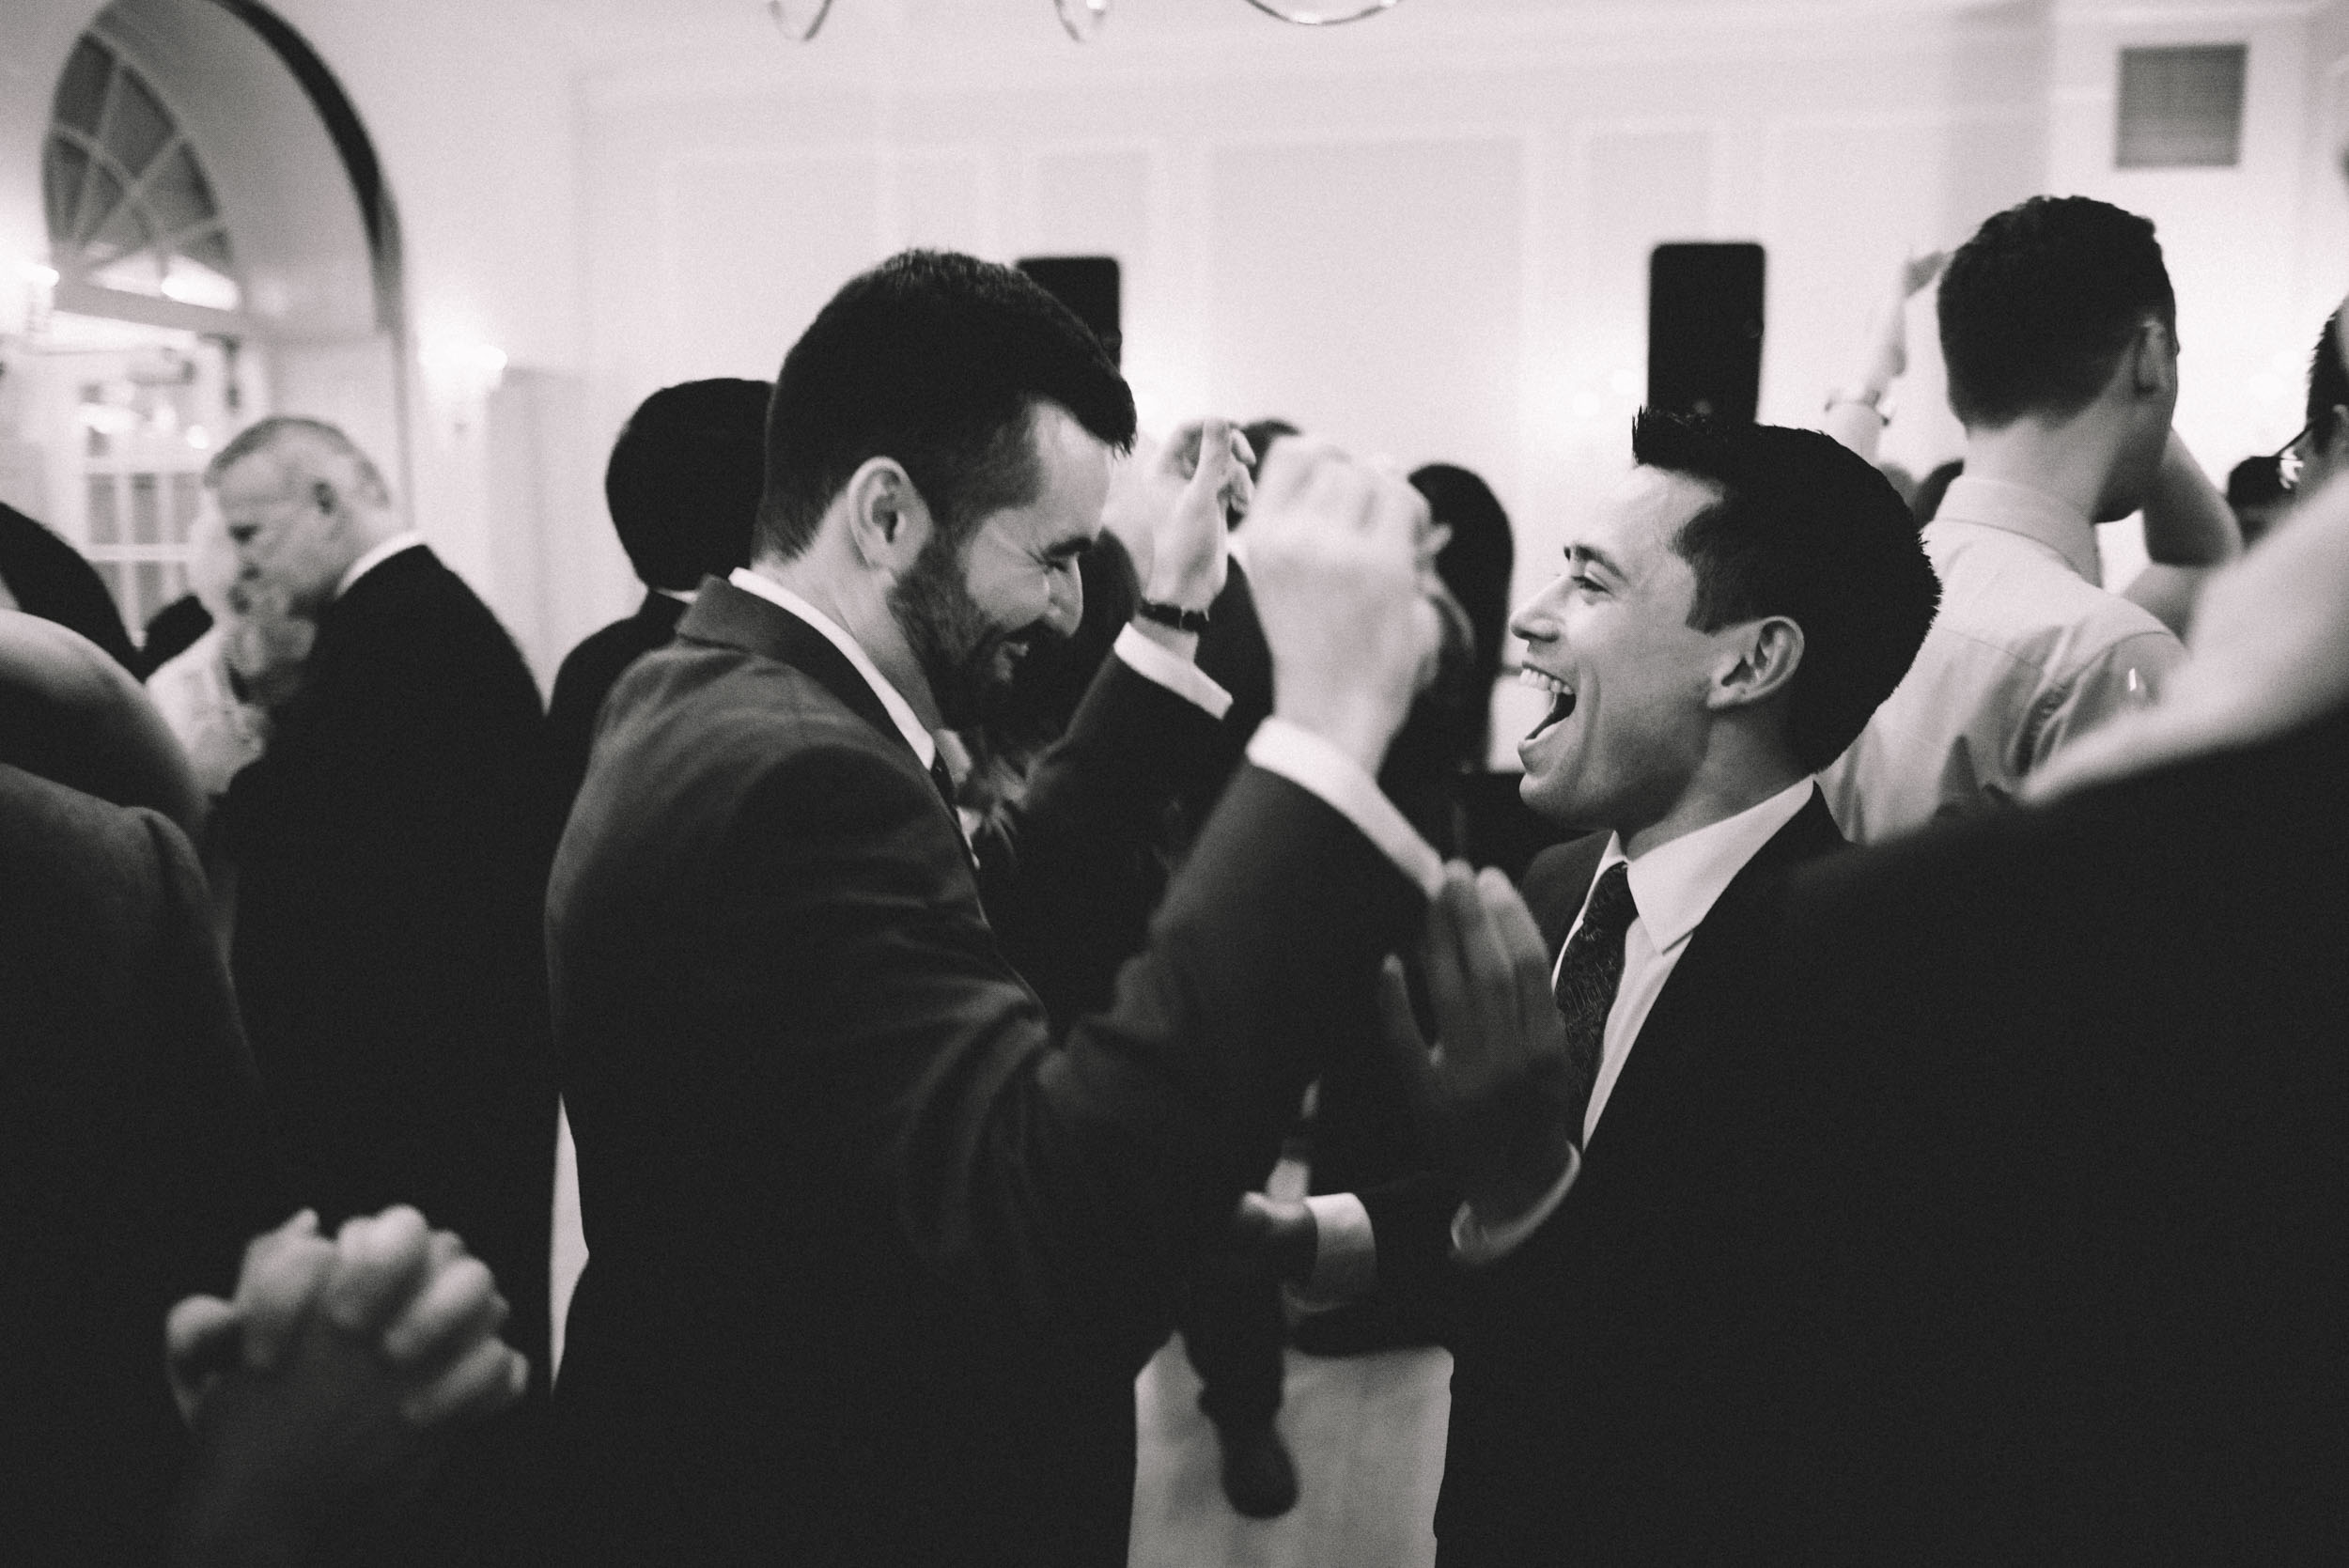 Dumbarton-House-wedding-85.jpg